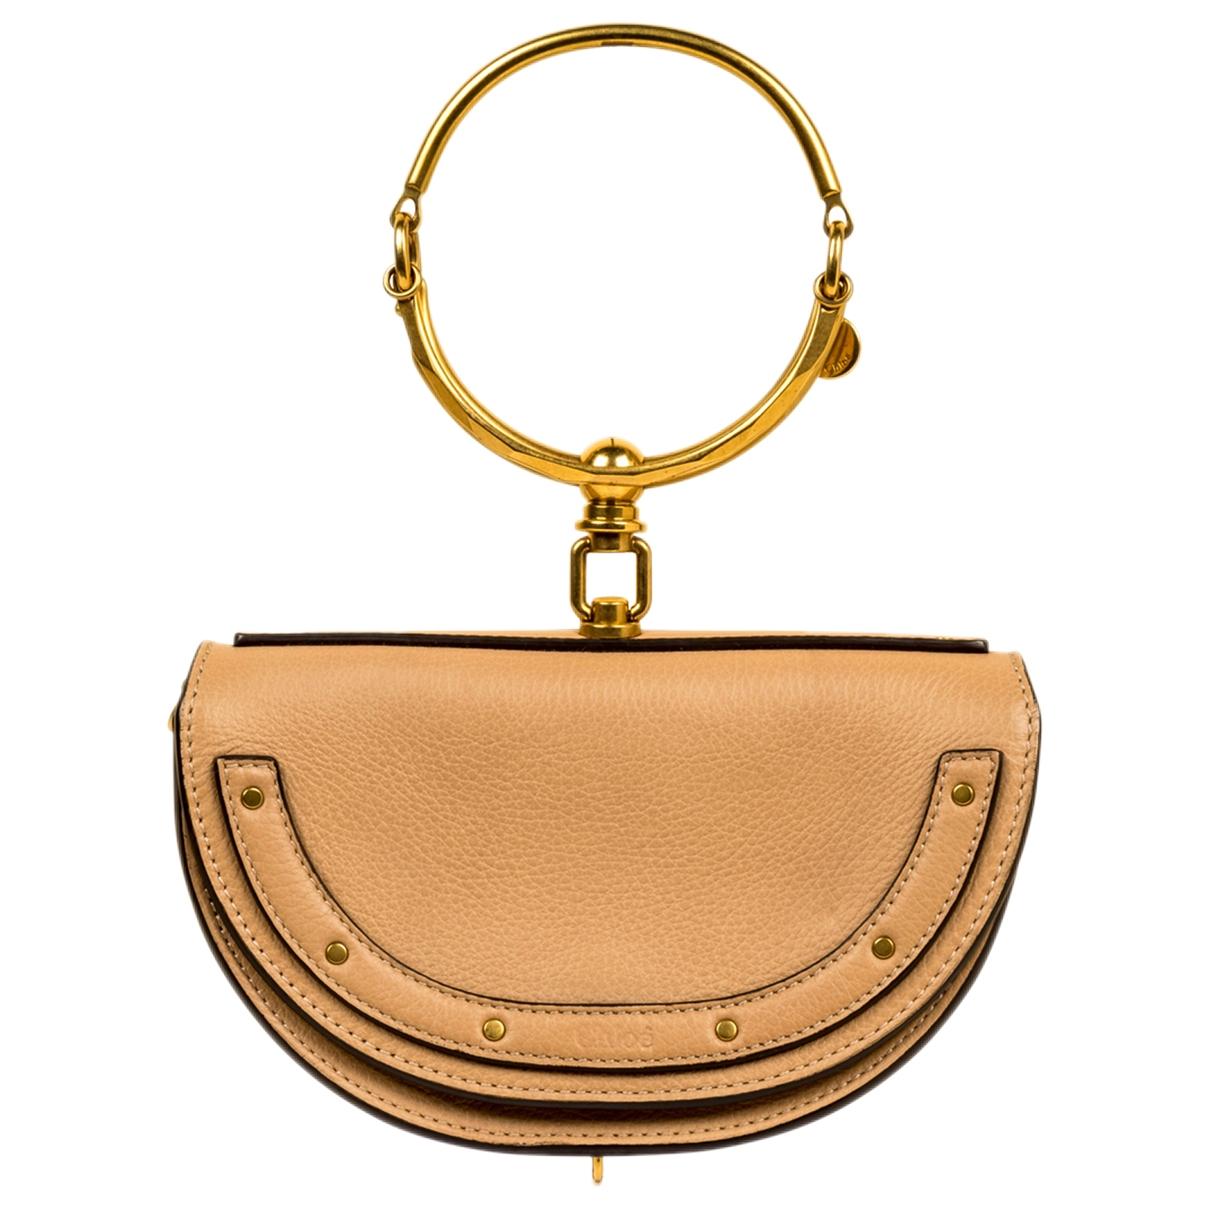 Bolso  Bracelet Nile de Cuero Chloe